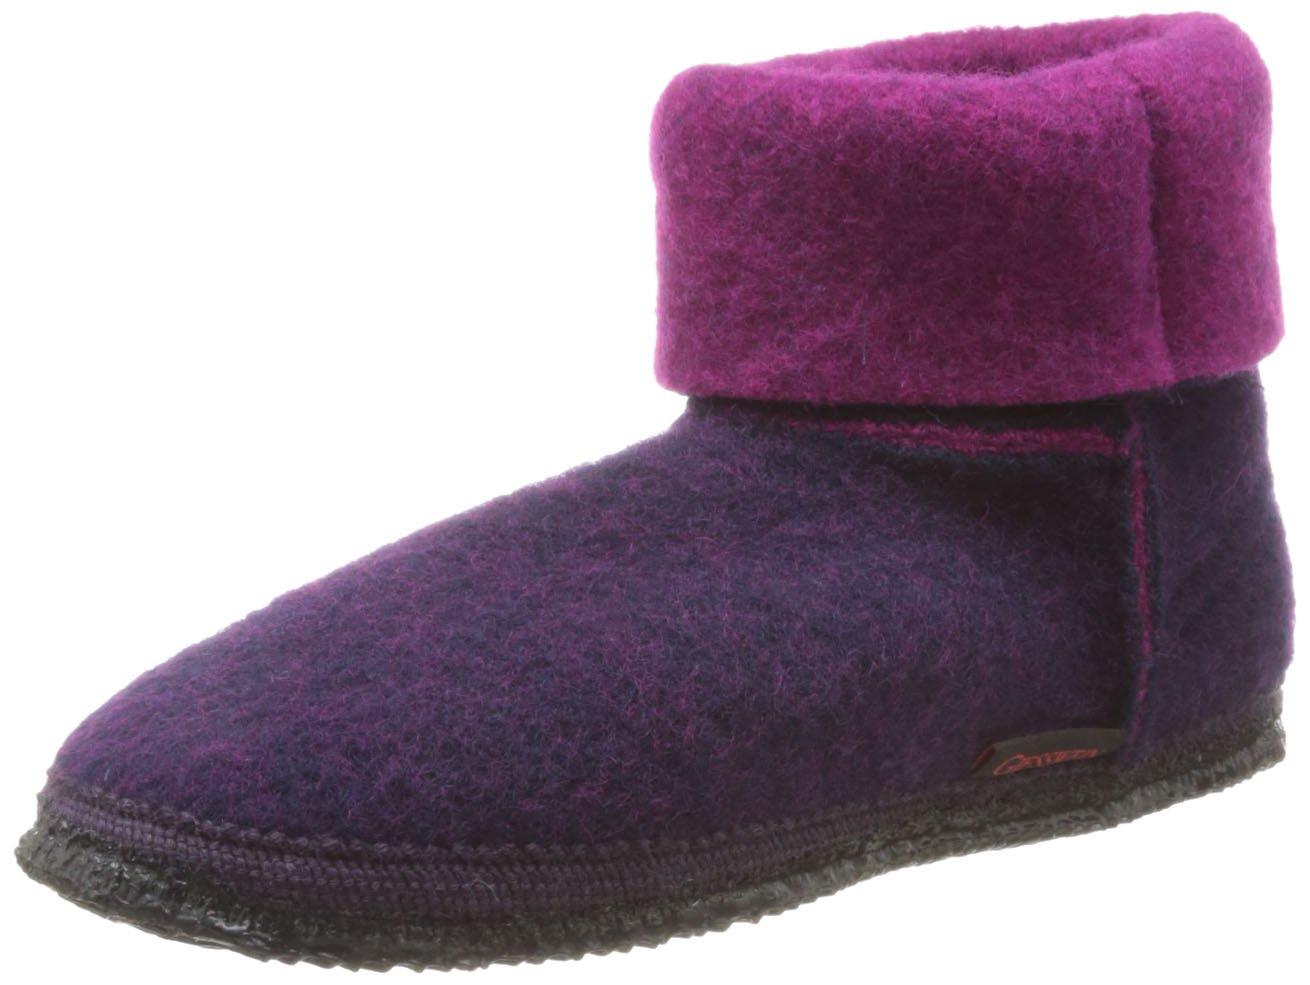 Giesswein Kemberg, B01F6ZZ6FC Chaussons Violet femme Violet (368 (368 Aubergine) 71d7850 - latesttechnology.space